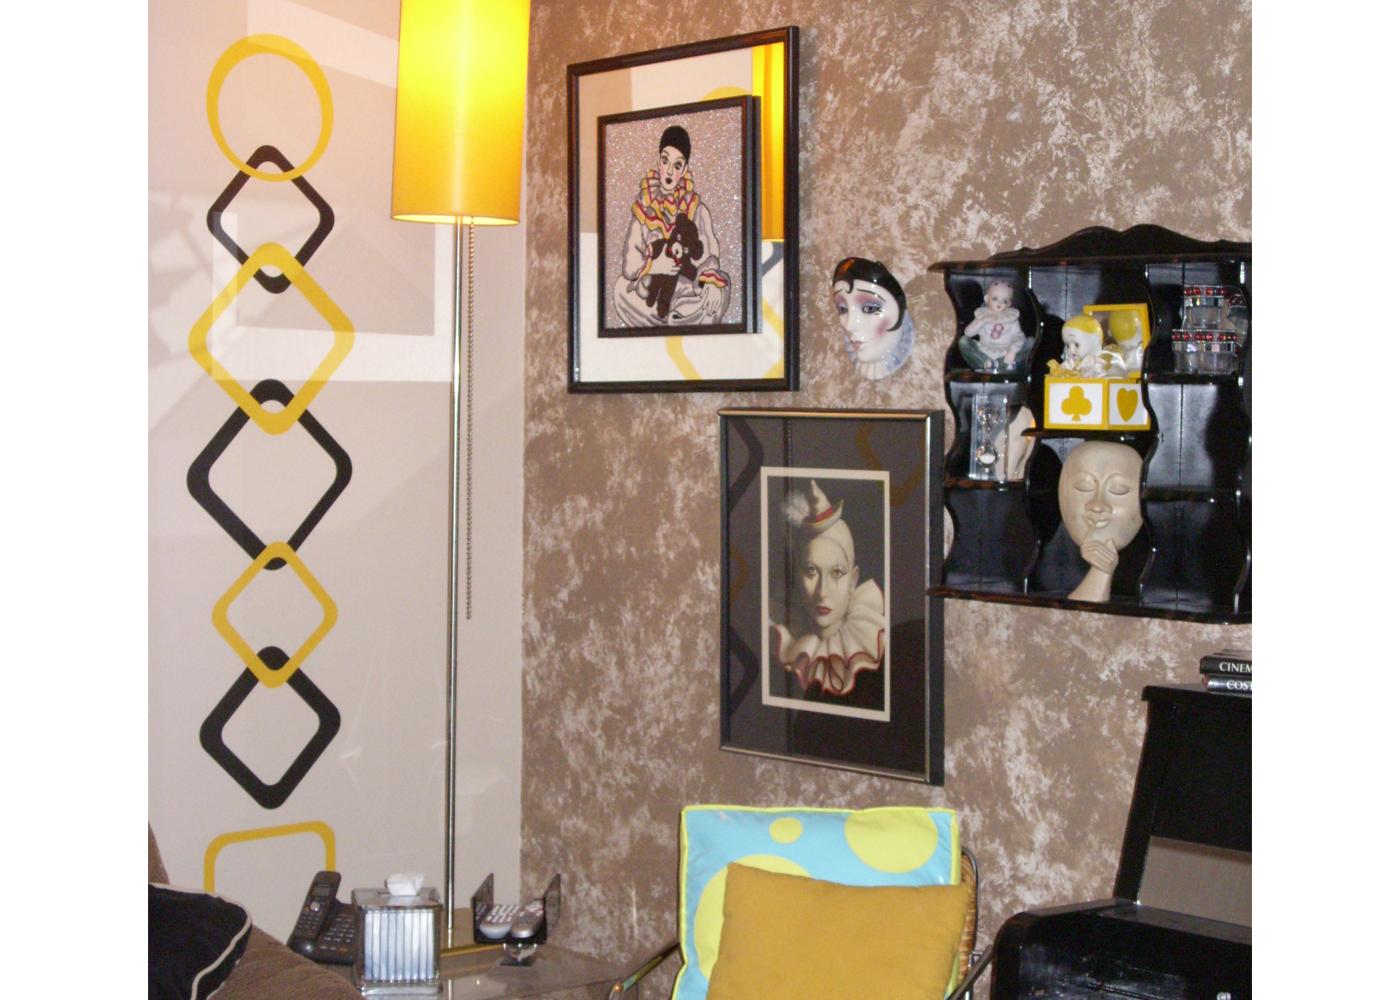 christine-koontz-vinyl-funky-square-decals-for-home-decor.jpg